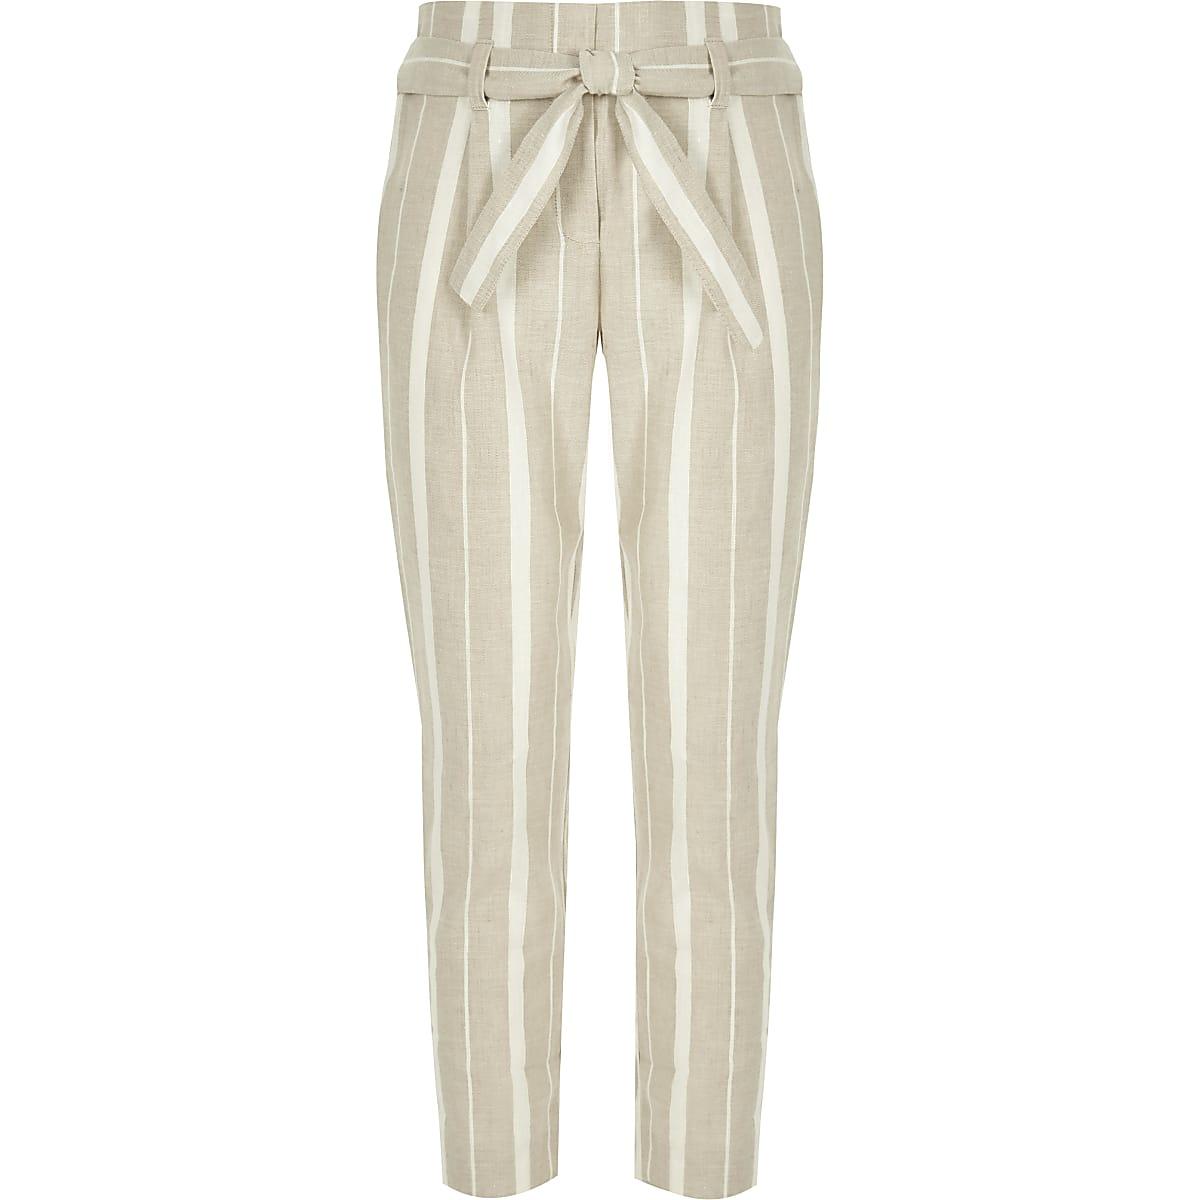 Neuf Rouge /& Blanc Rayure Fille Court Bloomers Pantalon Short Costume